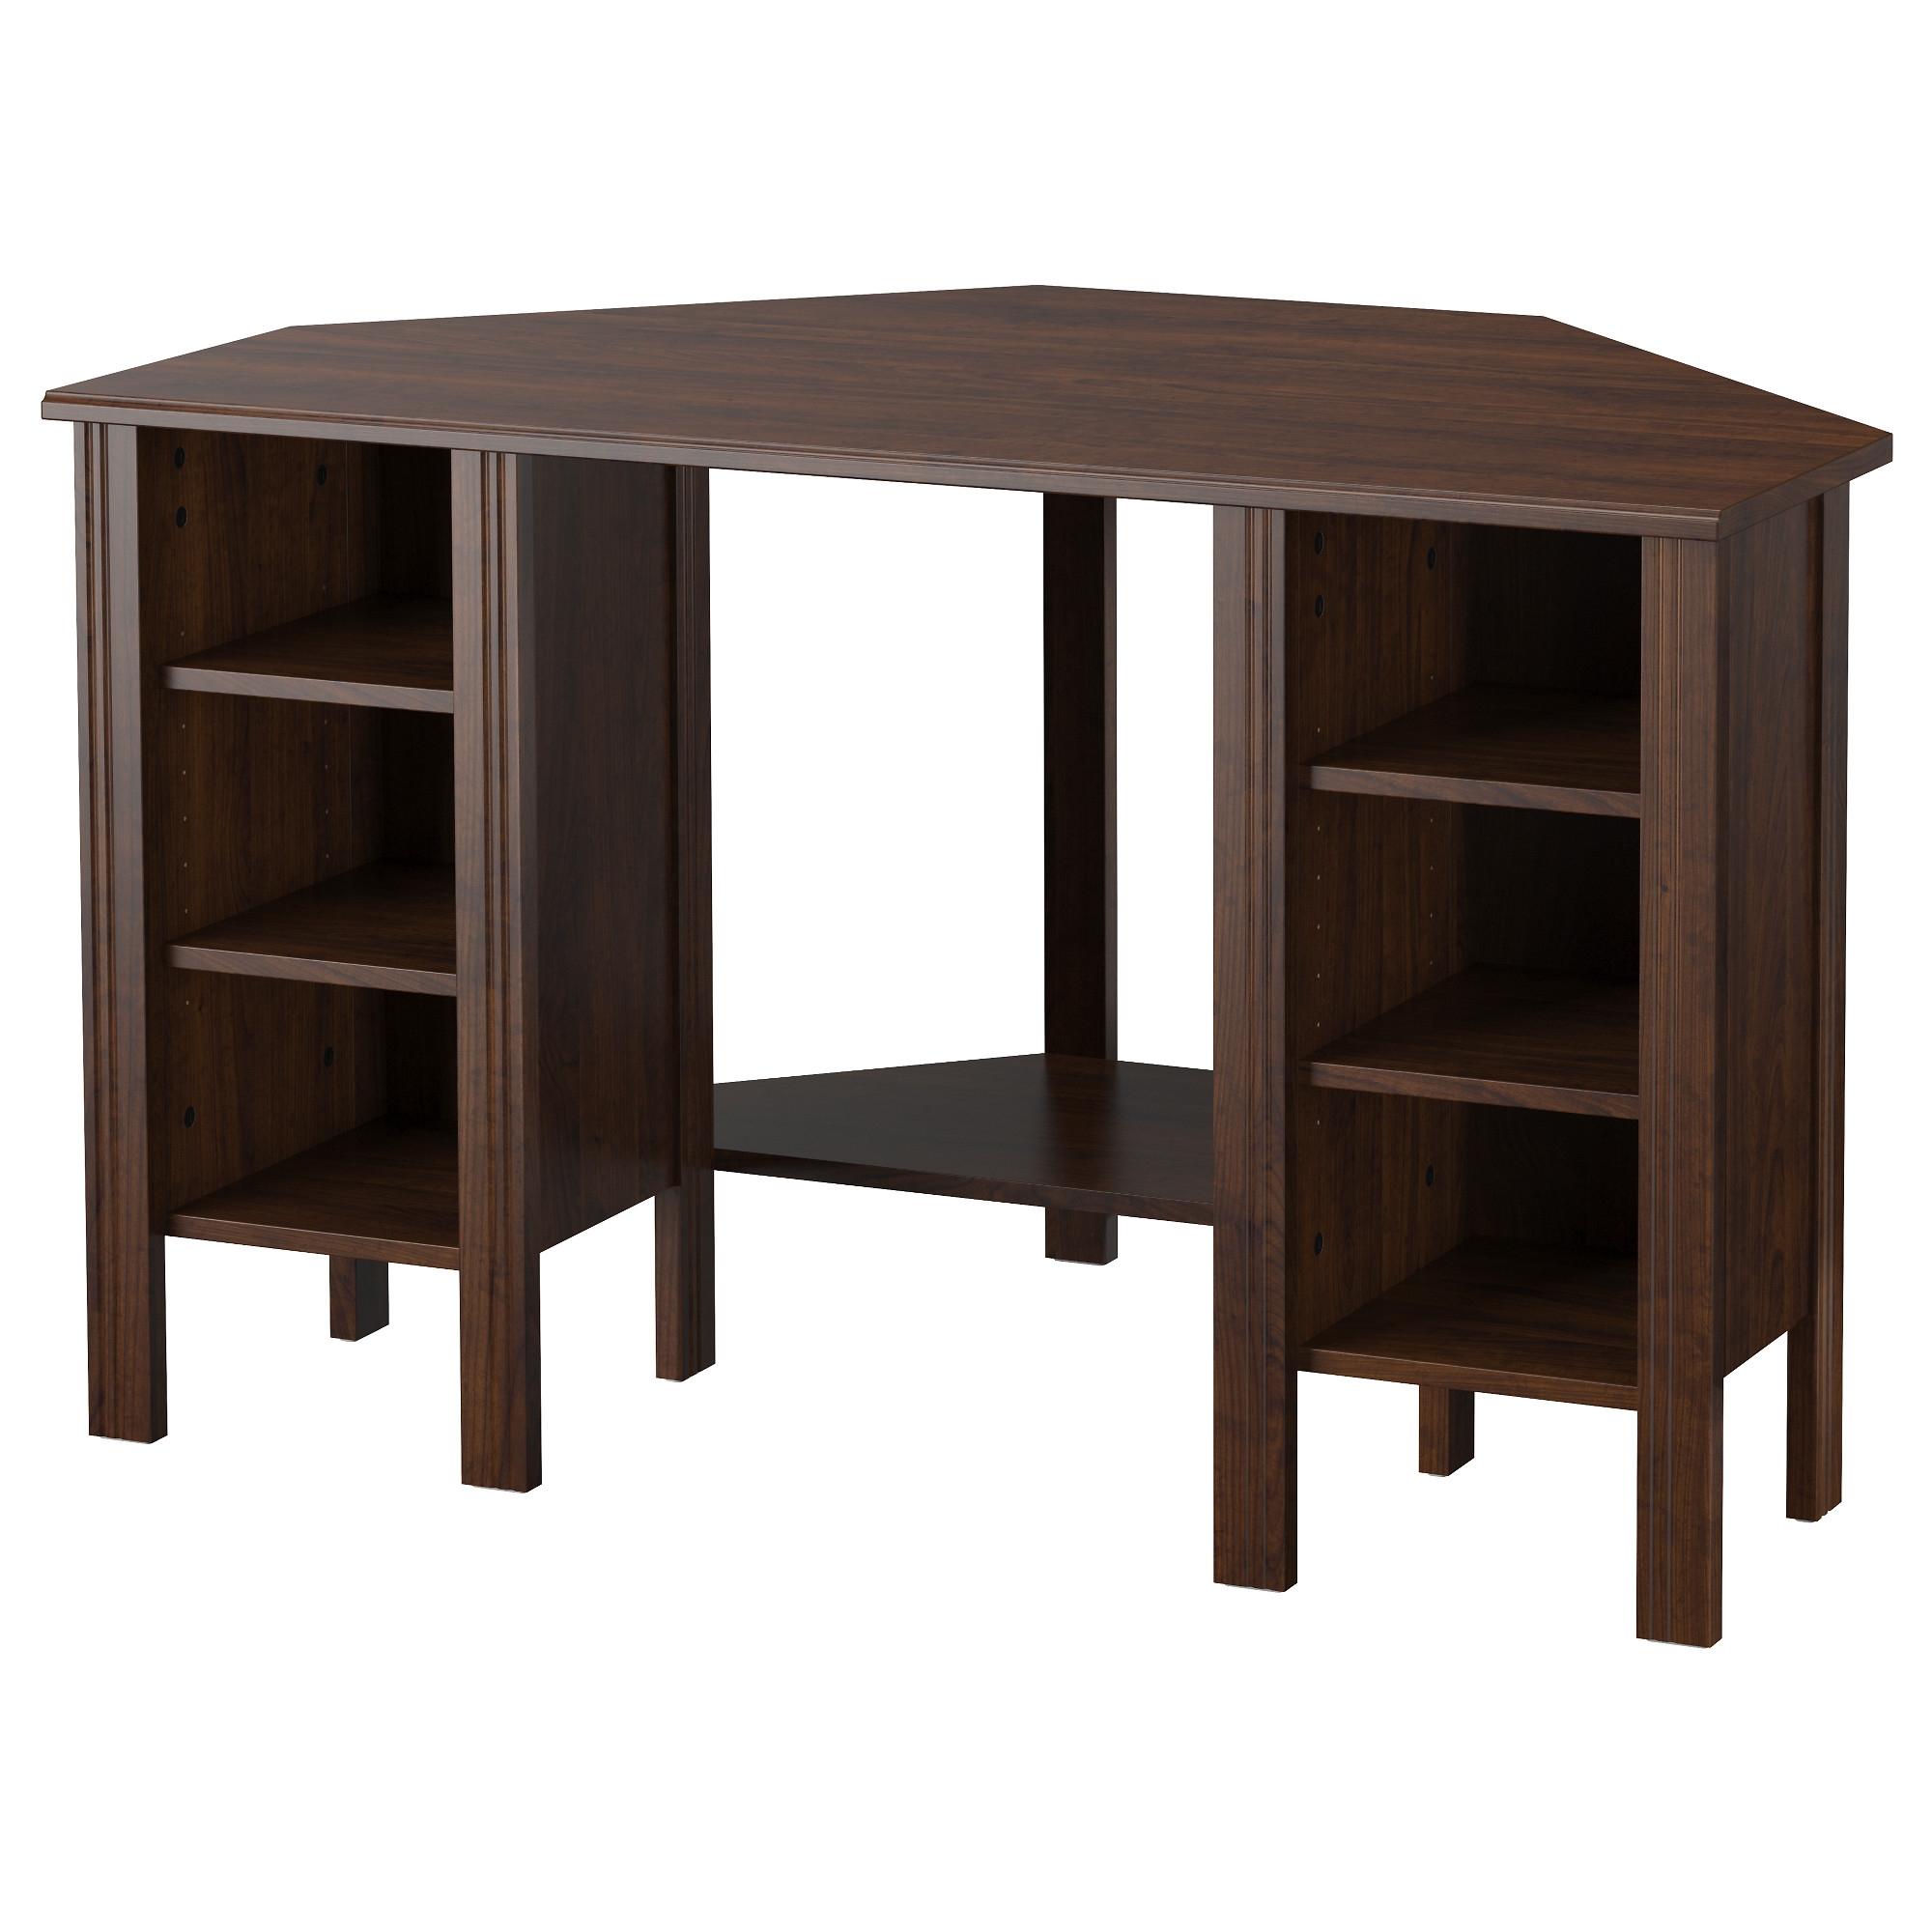 Brusali escritorio de esquina - Mesa escritorio esquina ...